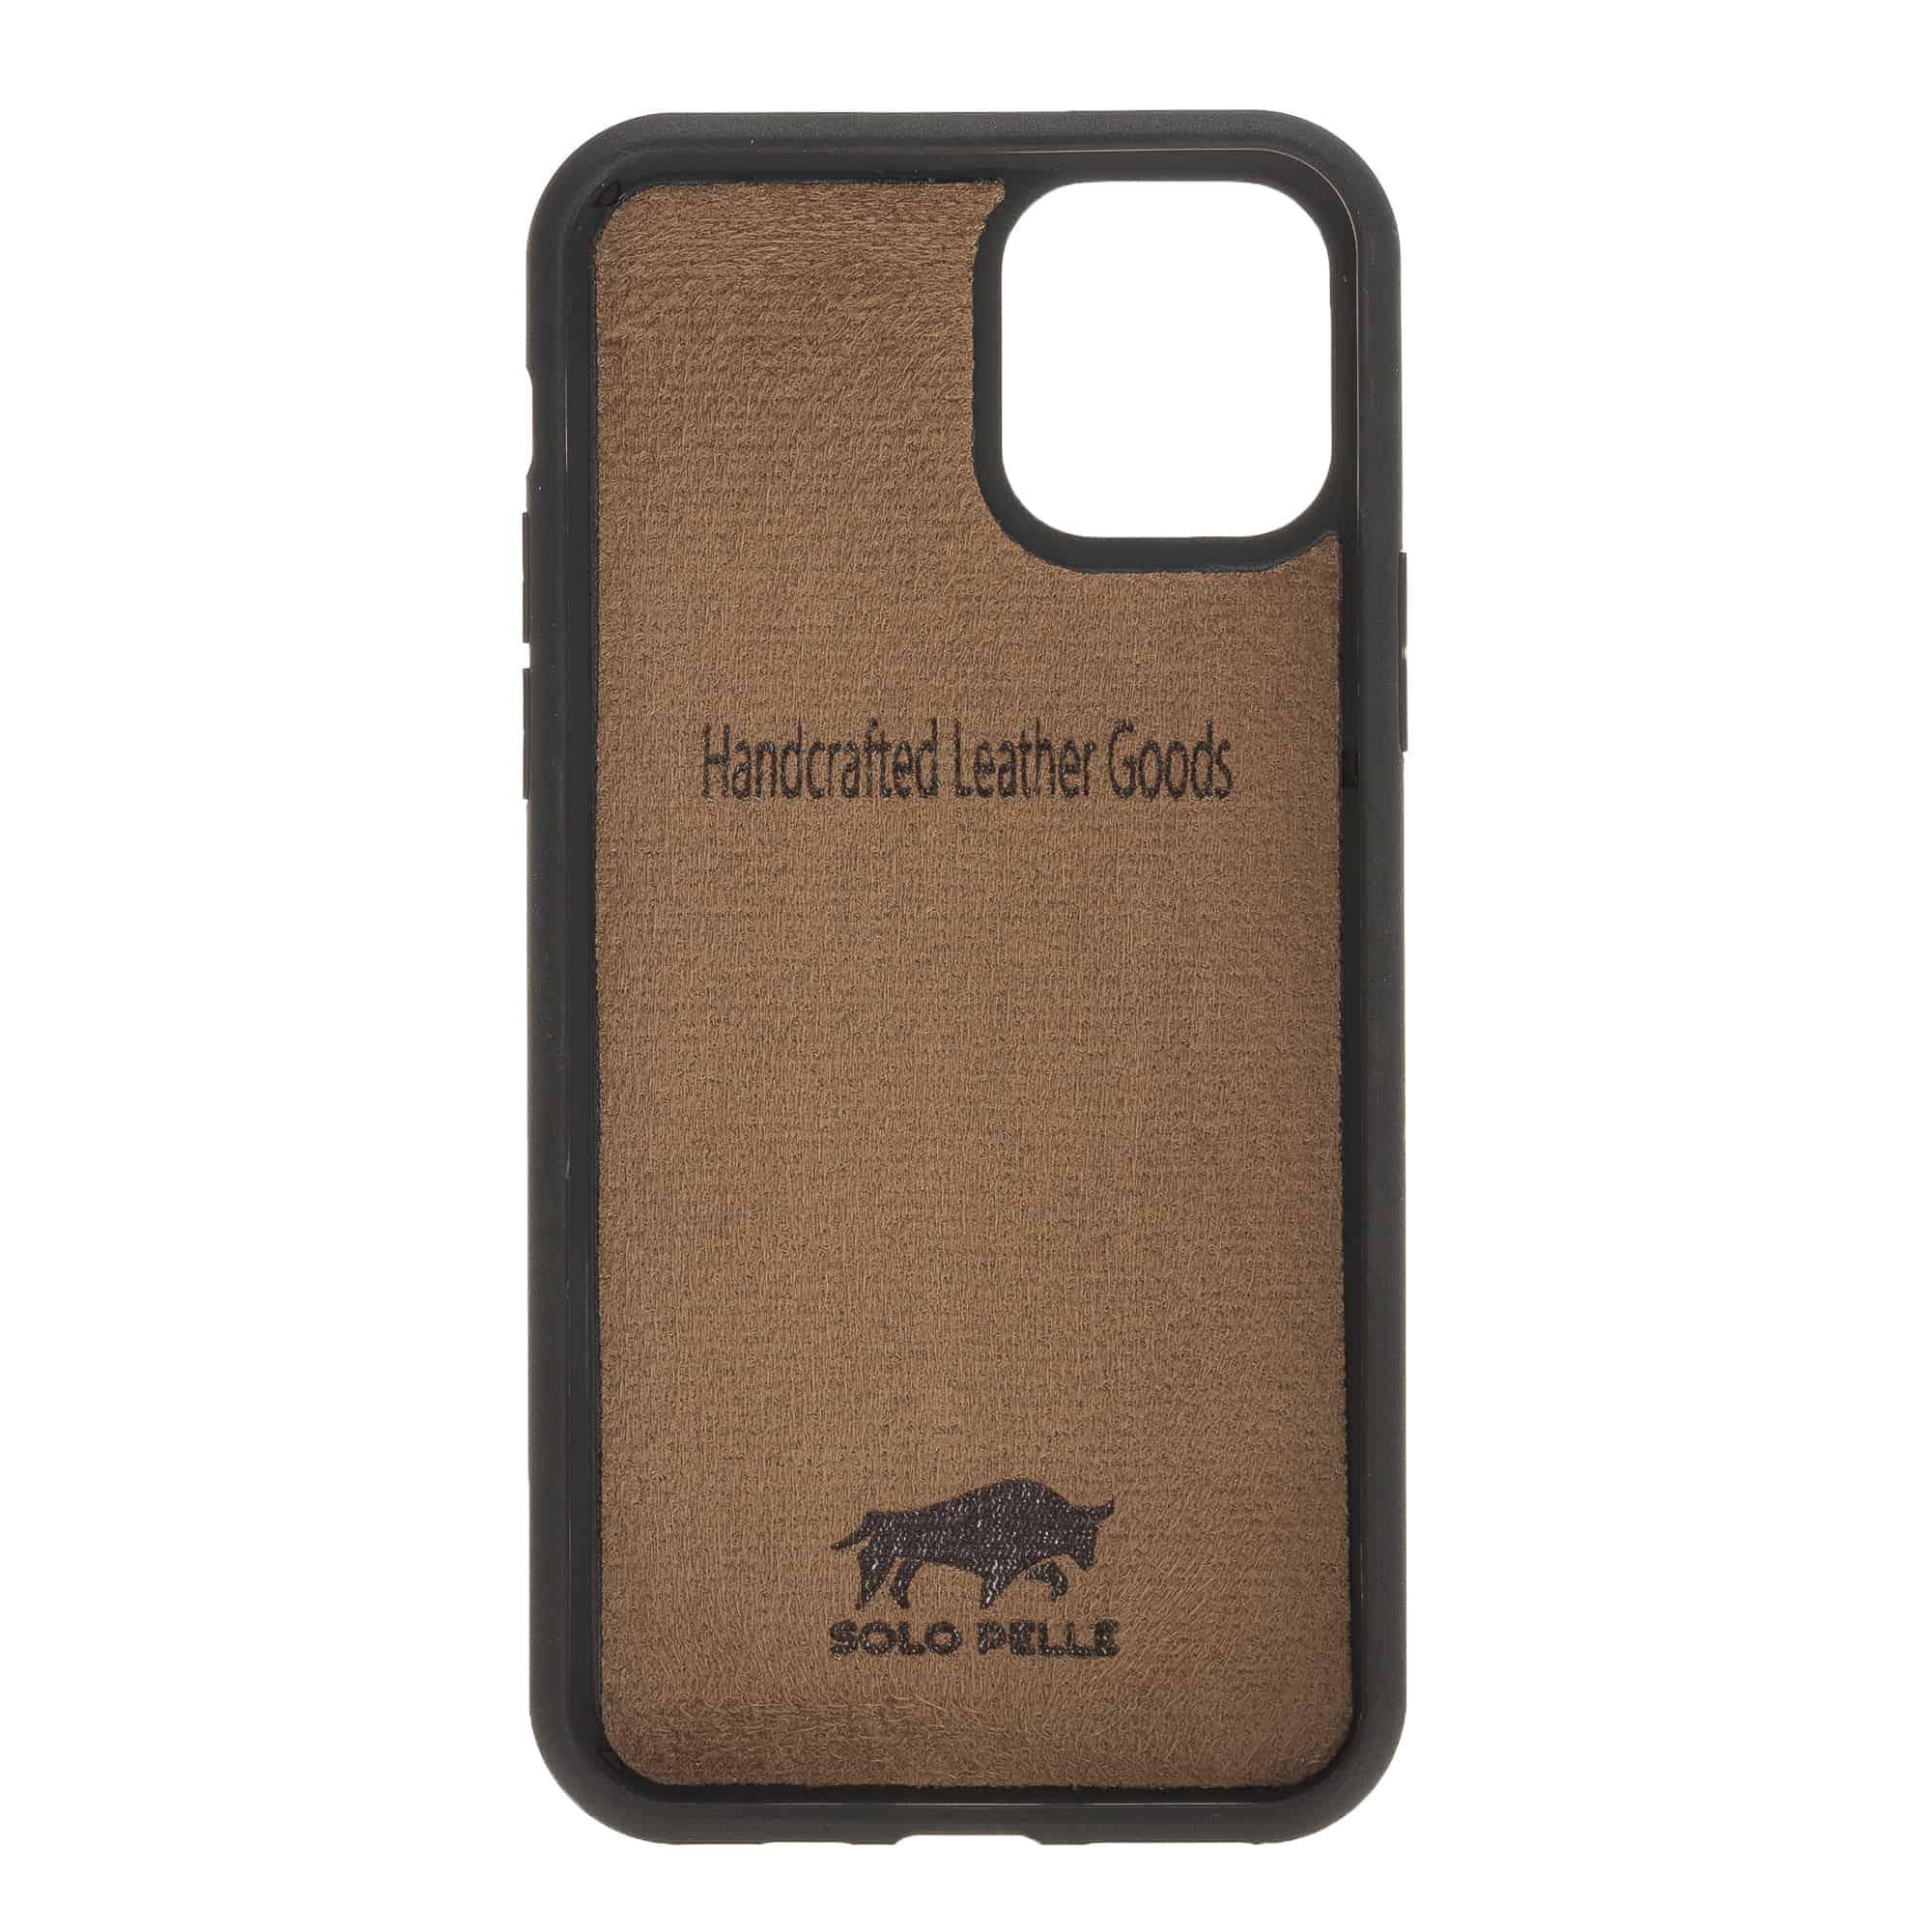 Solo Pelle Lederhülle für das iPhone 11 Pro in 5.8 Zoll Stanford Case Leder Hülle Ledertasche Backcover aus echtem Leder (Cognac Braun Burned)